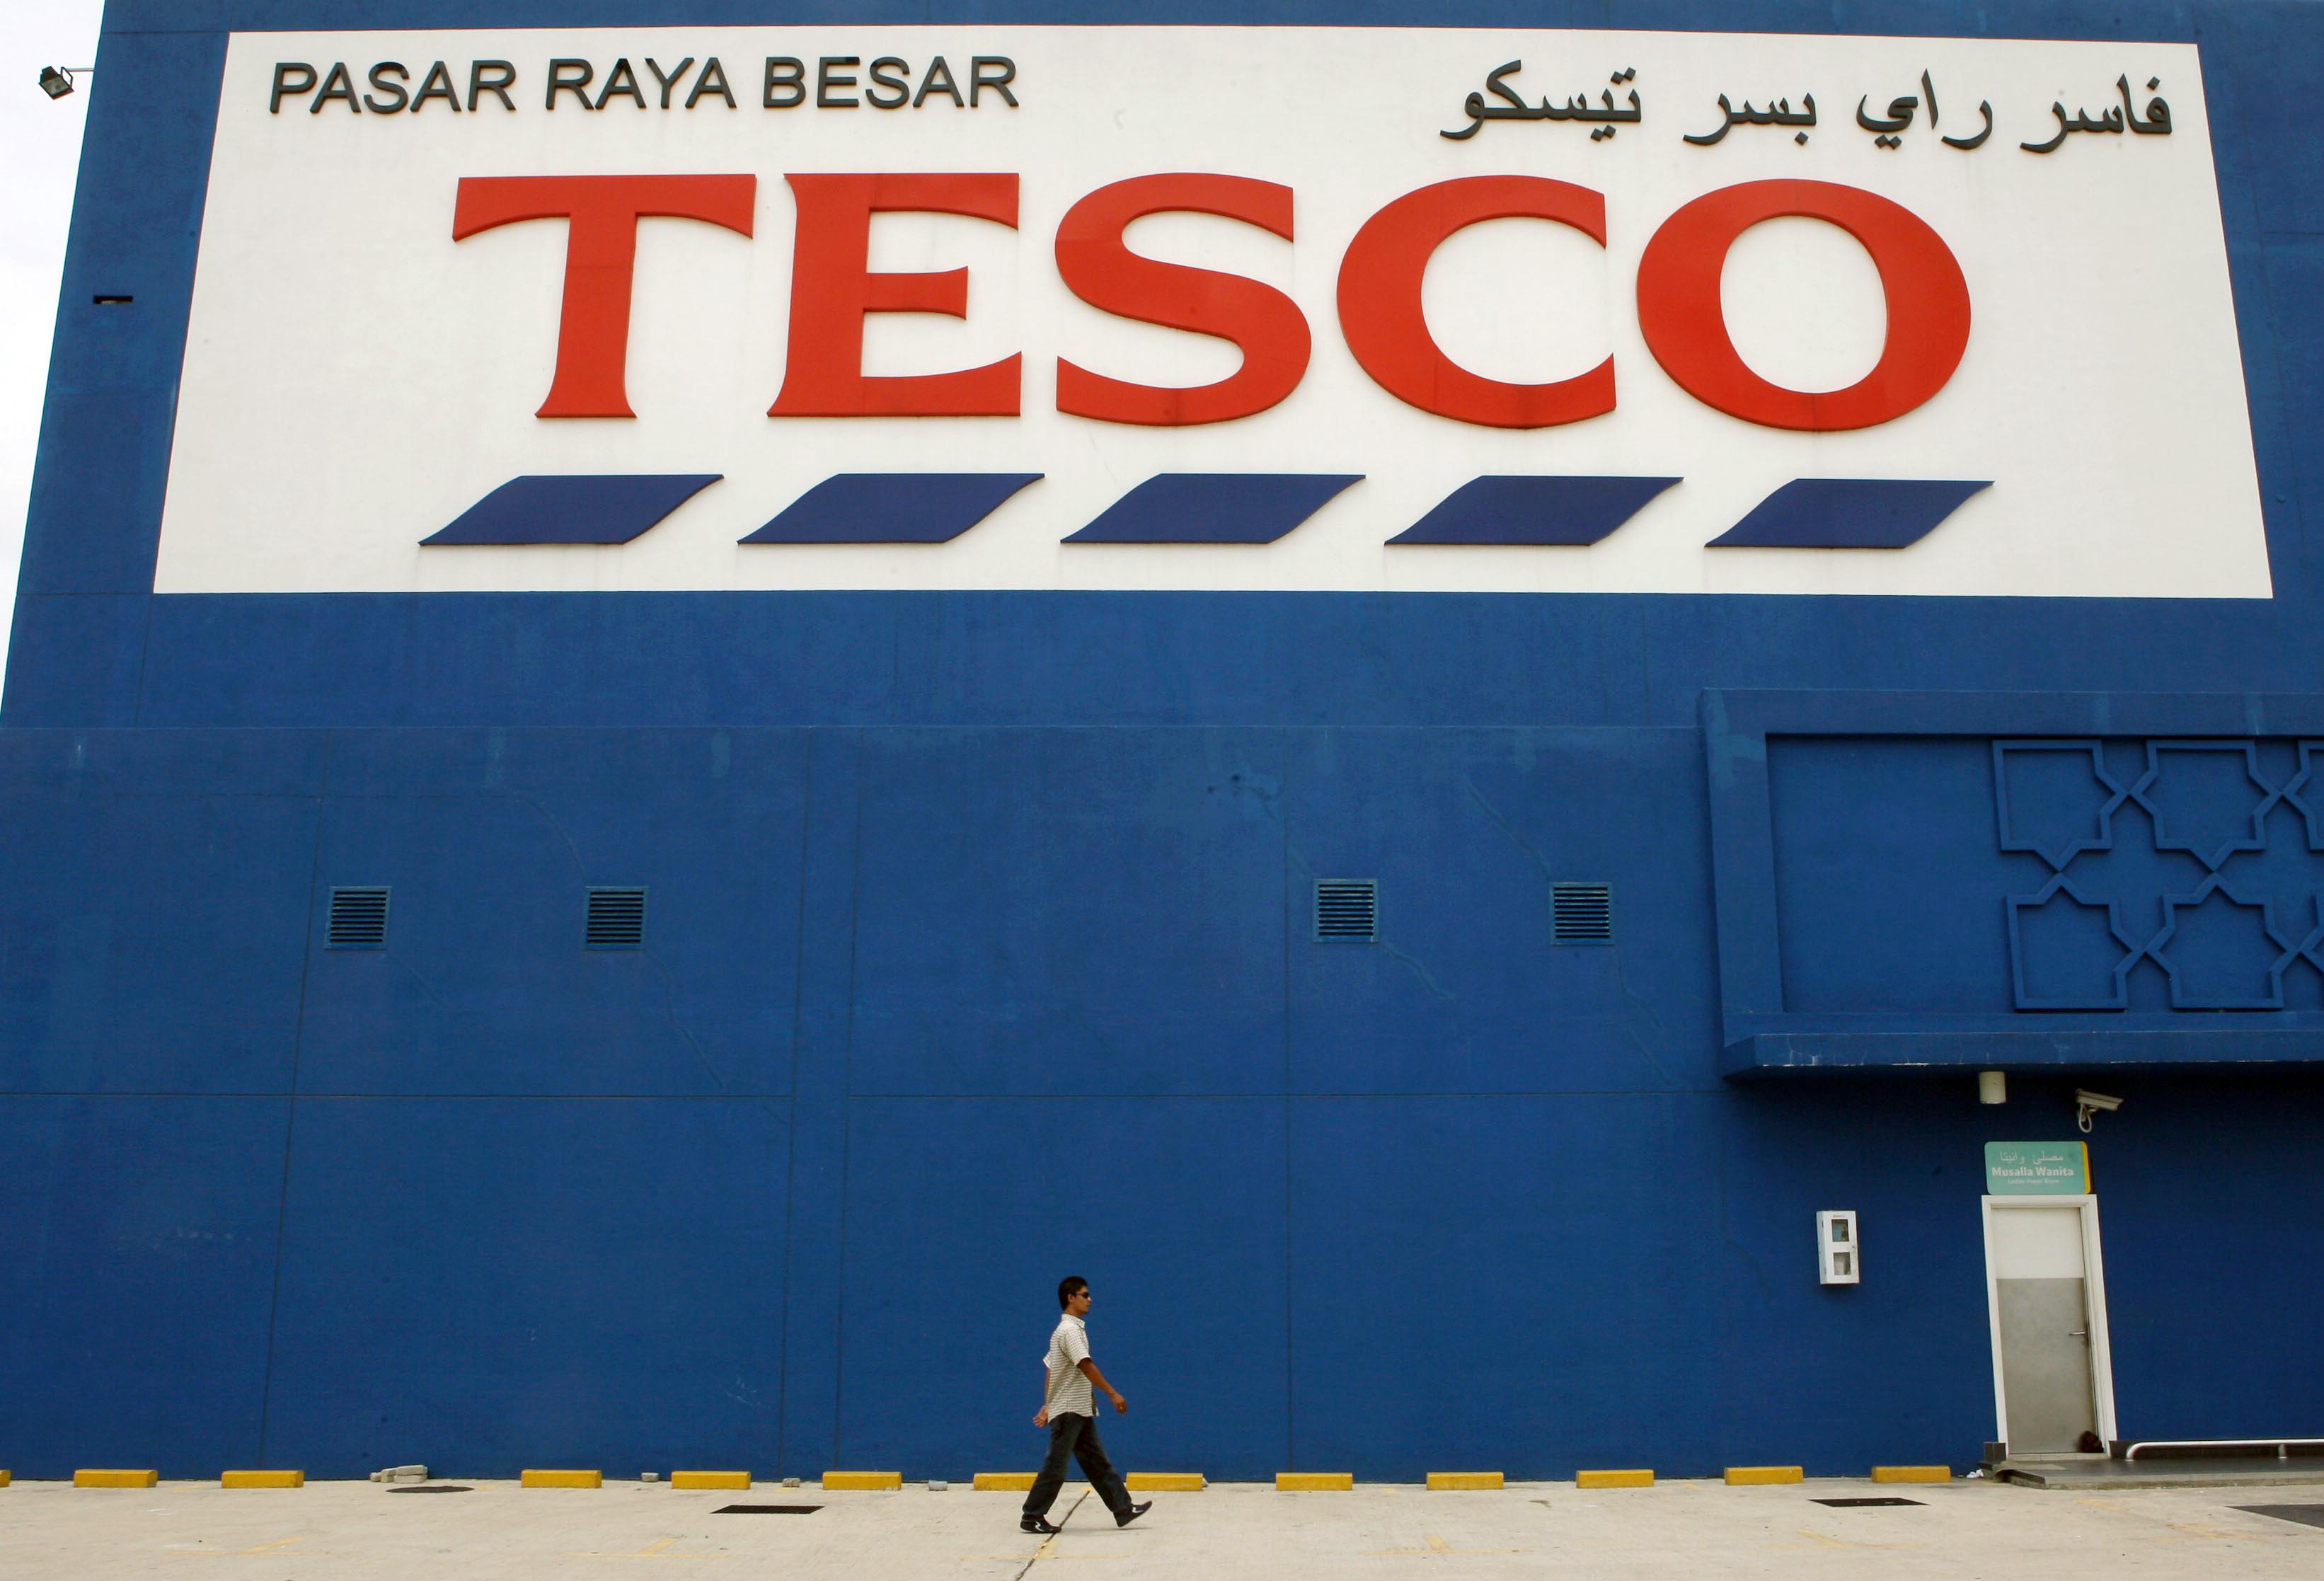 A pedestrian walks past a Tesco Plc hypermarket in Kota Bhar